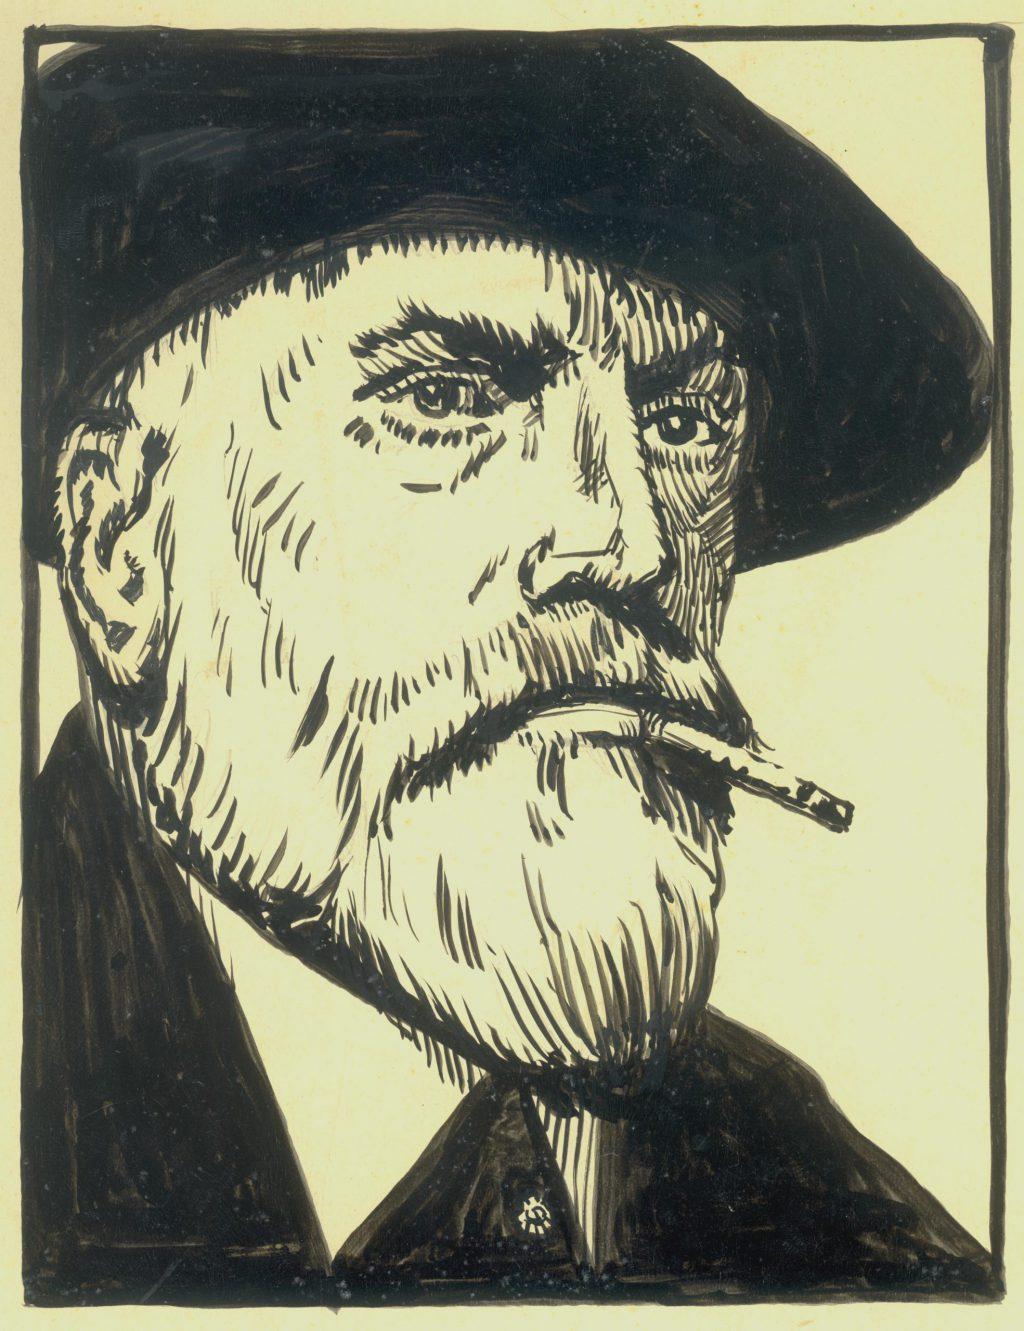 Piet Kramer, zelfportret, ca. 1925 (TMS 75842)